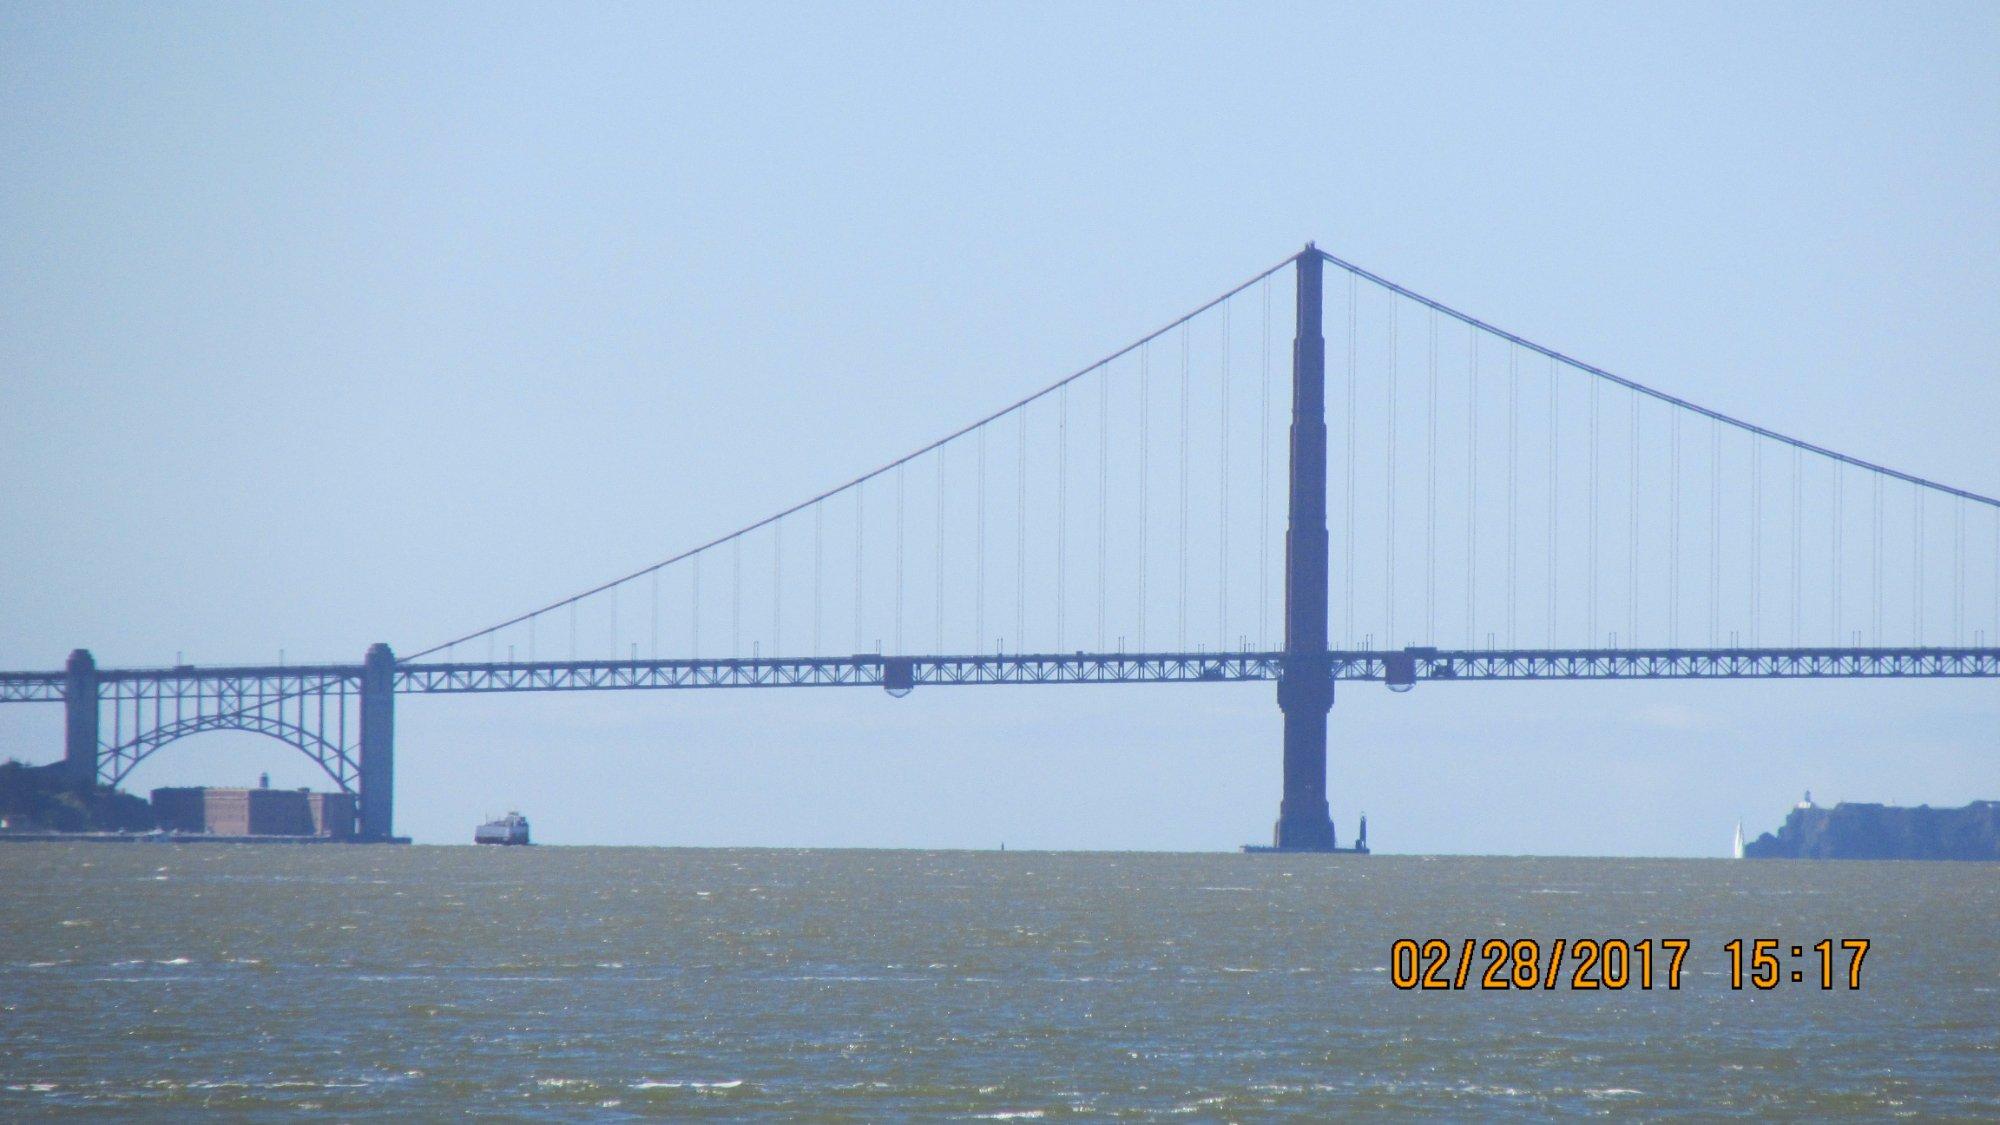 Golden Gate bridge from Treasure Island